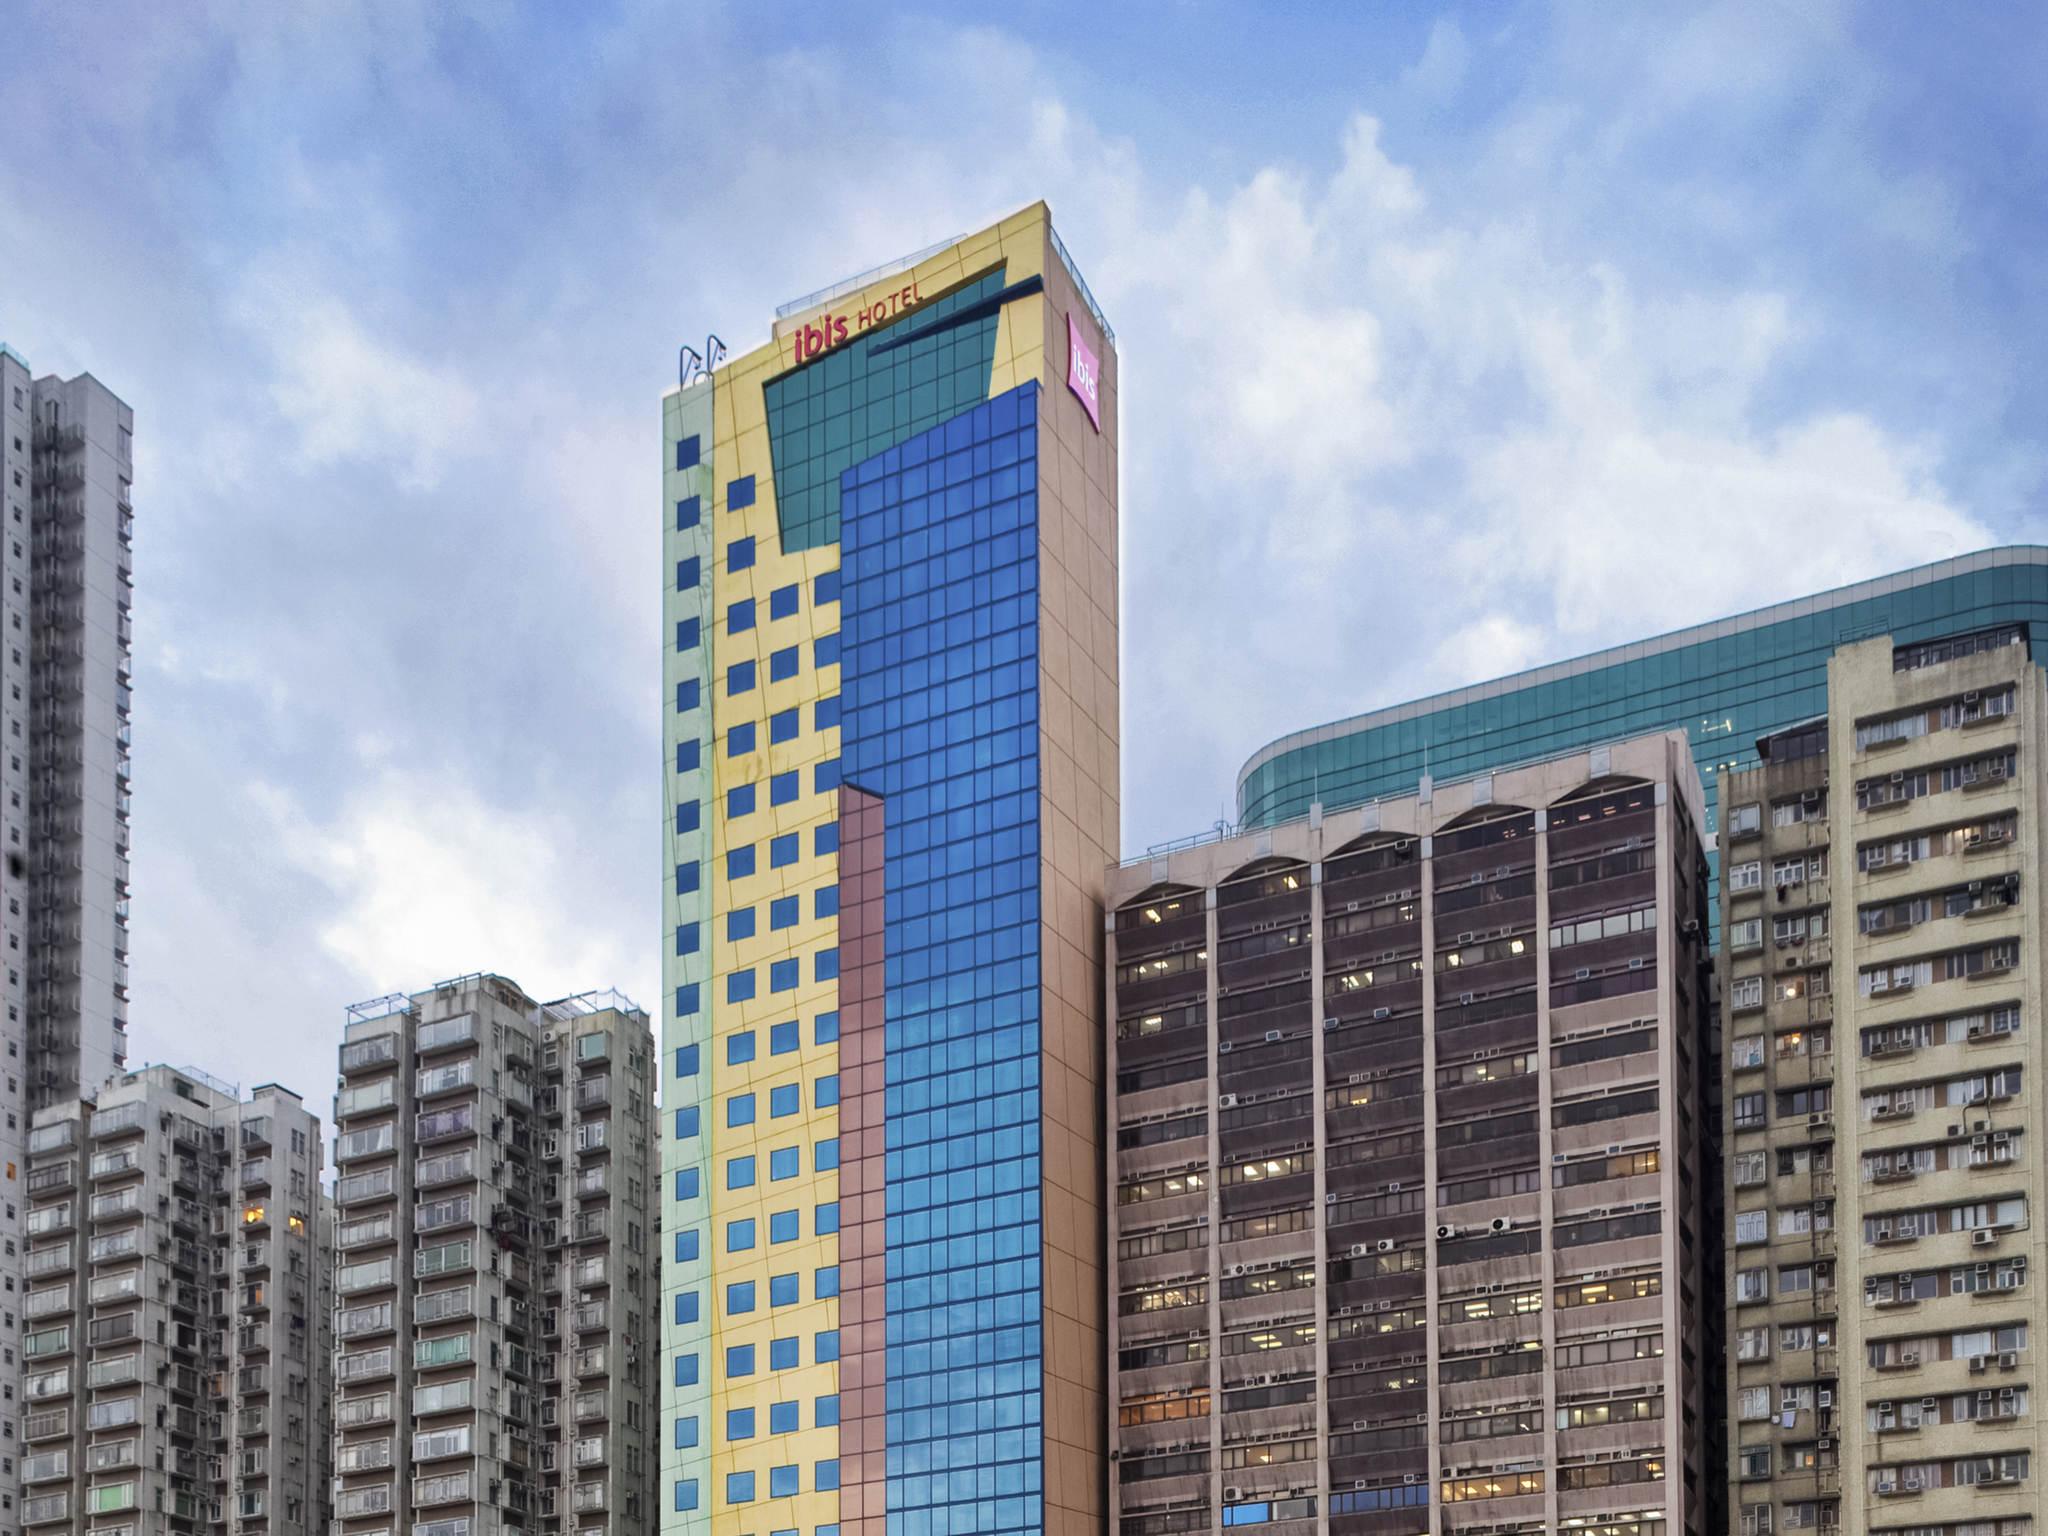 فندق - إيبيس ibis هونغ كونغ نورث بوينت